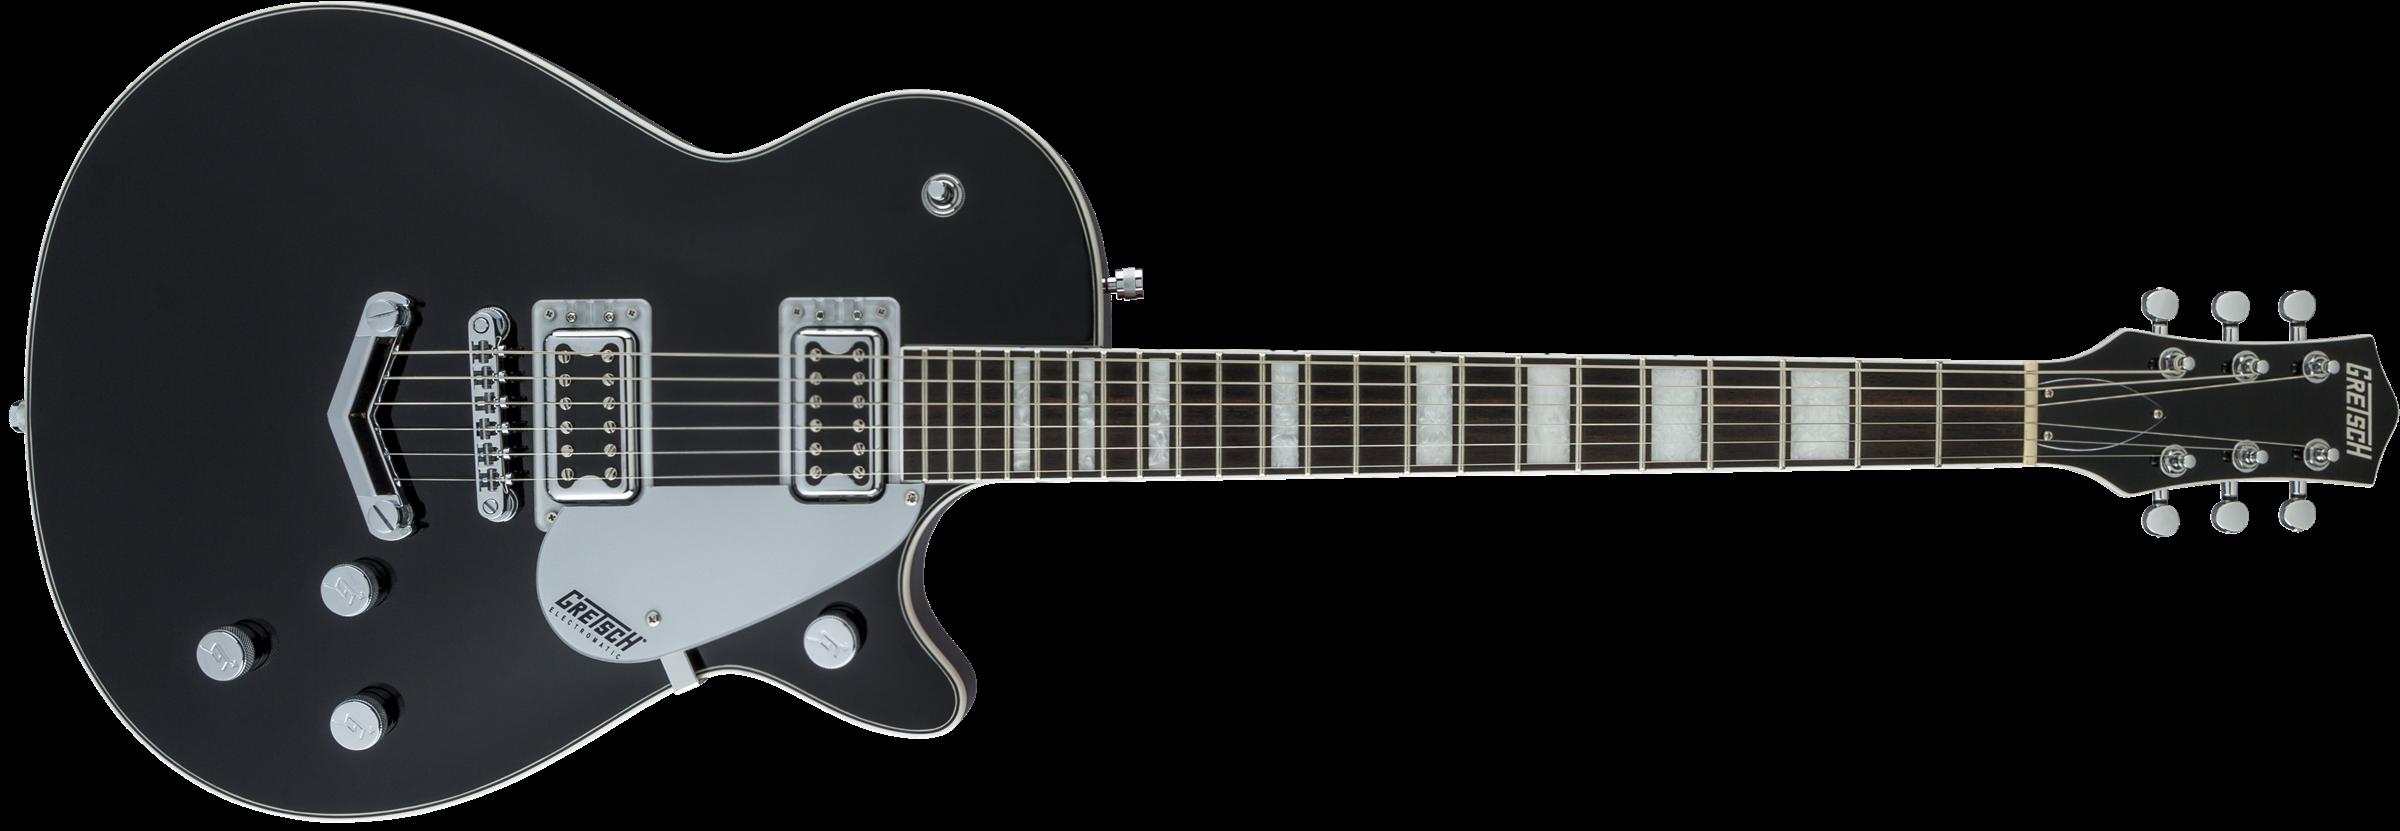 GRETSCH G5220 Electromatic Jet BT Single-Cut with V-Stoptail, Black Walnut Fingerboard, Black